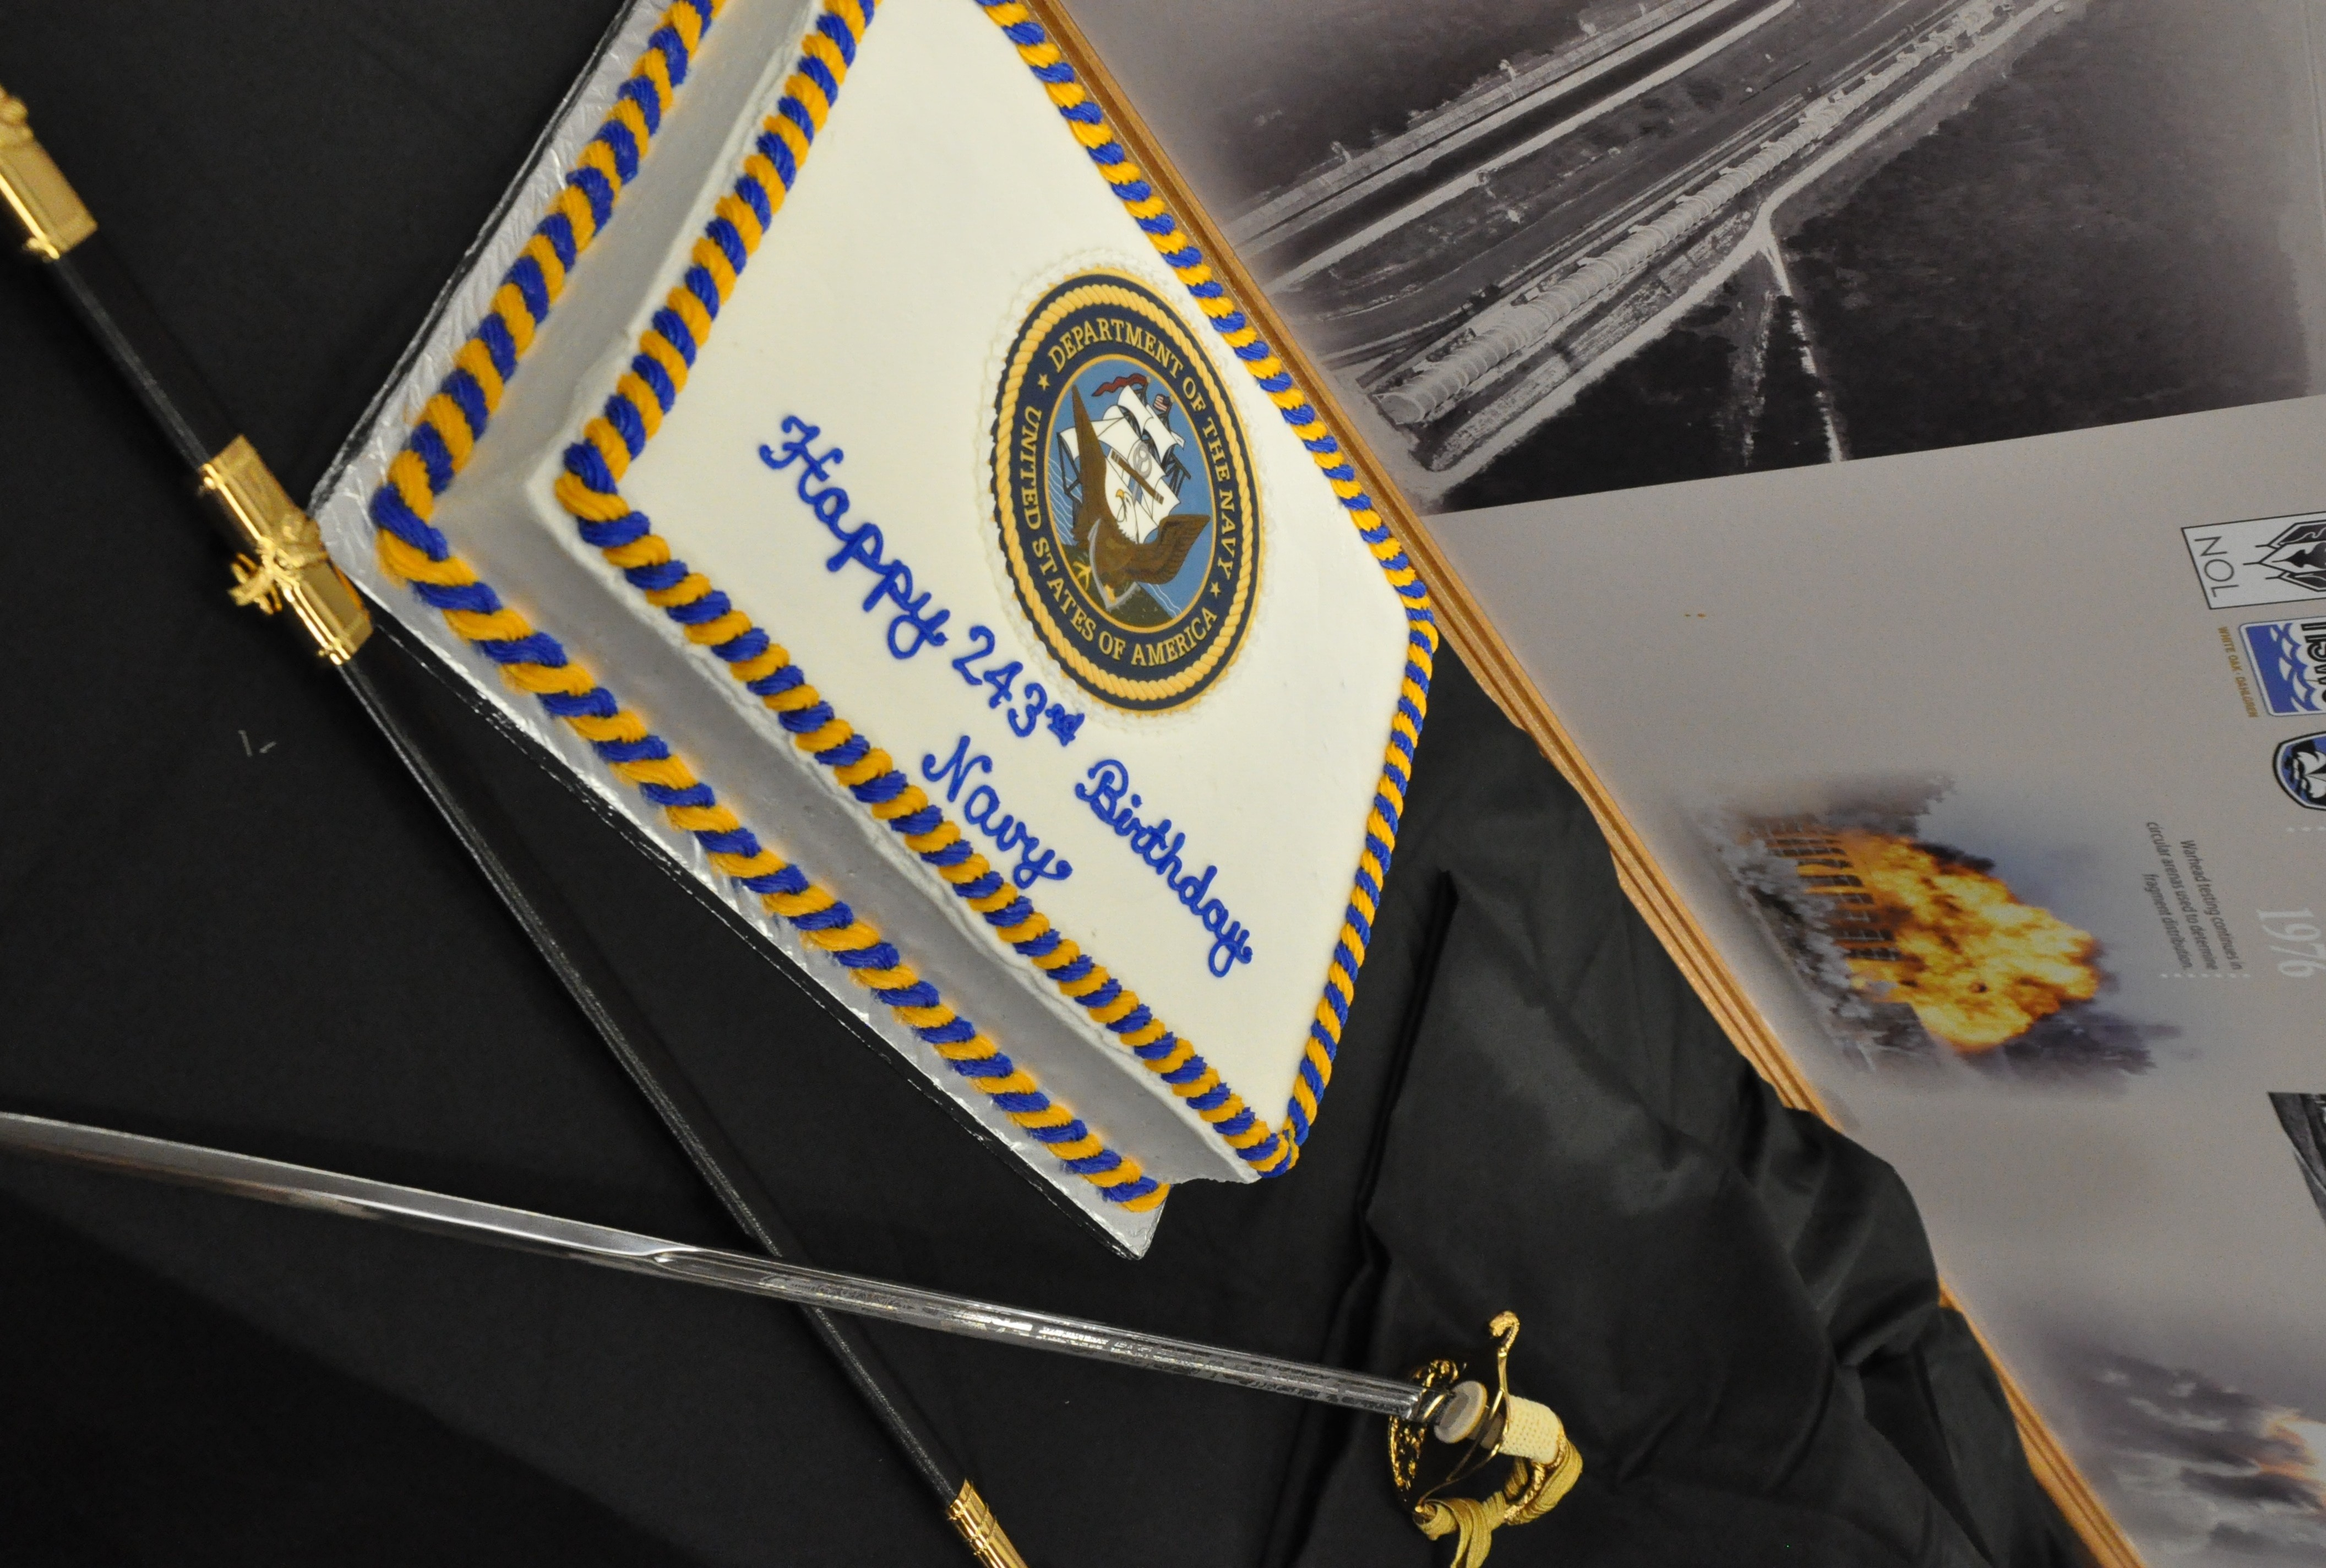 Phenomenal Nswcdd Celebrates The 243Rd Navy Birthday Funny Birthday Cards Online Fluifree Goldxyz